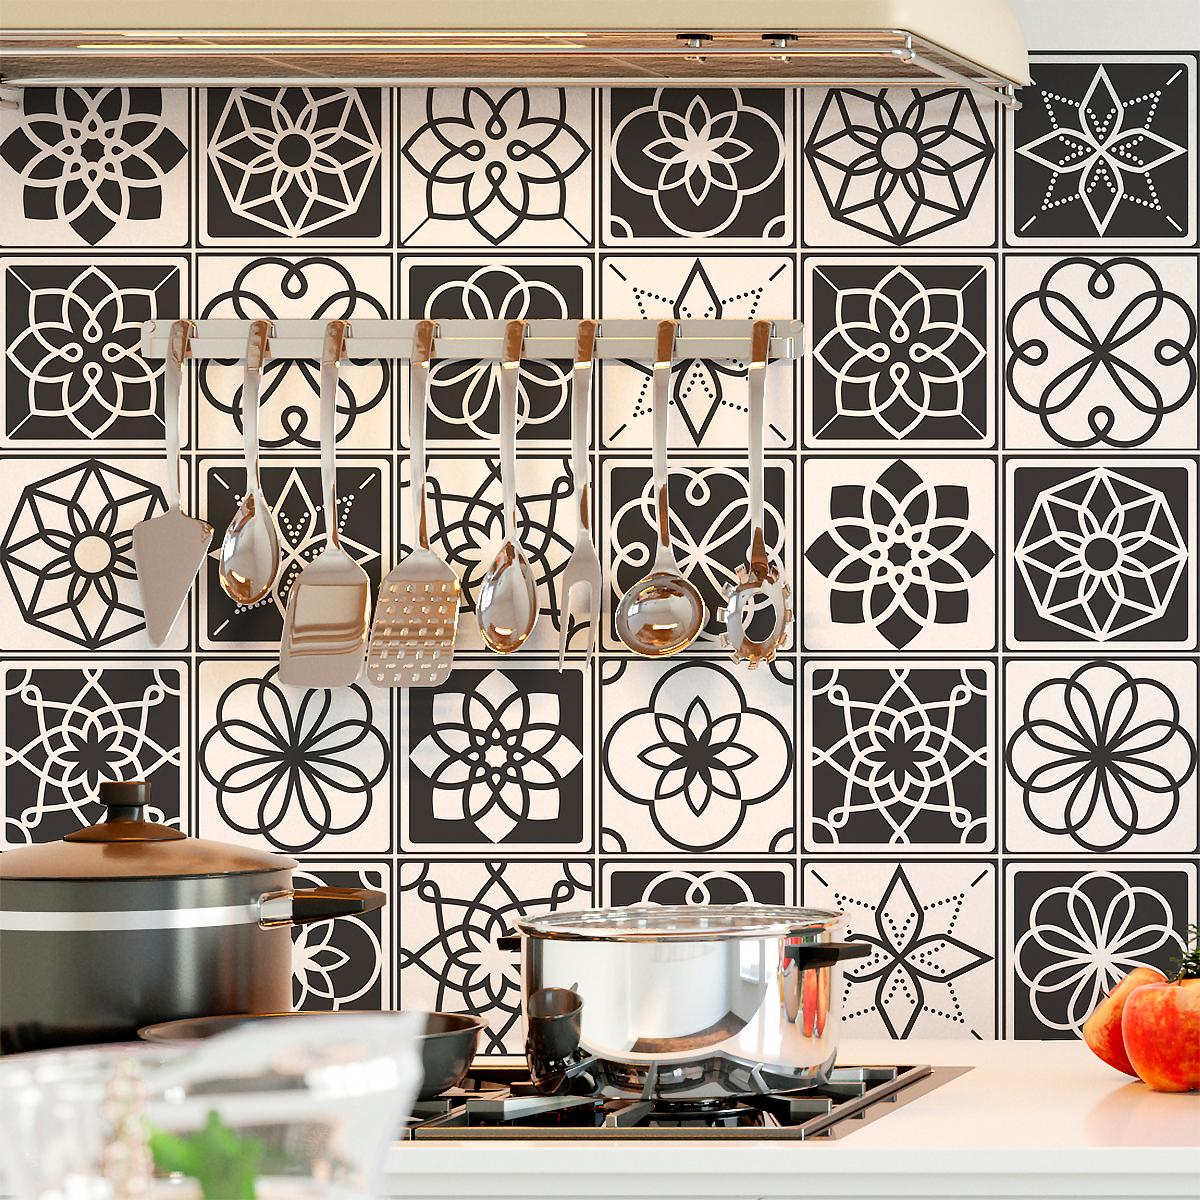 30 stickers carrelages azulejos lima cuisine carrelages ambiance sticker. Black Bedroom Furniture Sets. Home Design Ideas